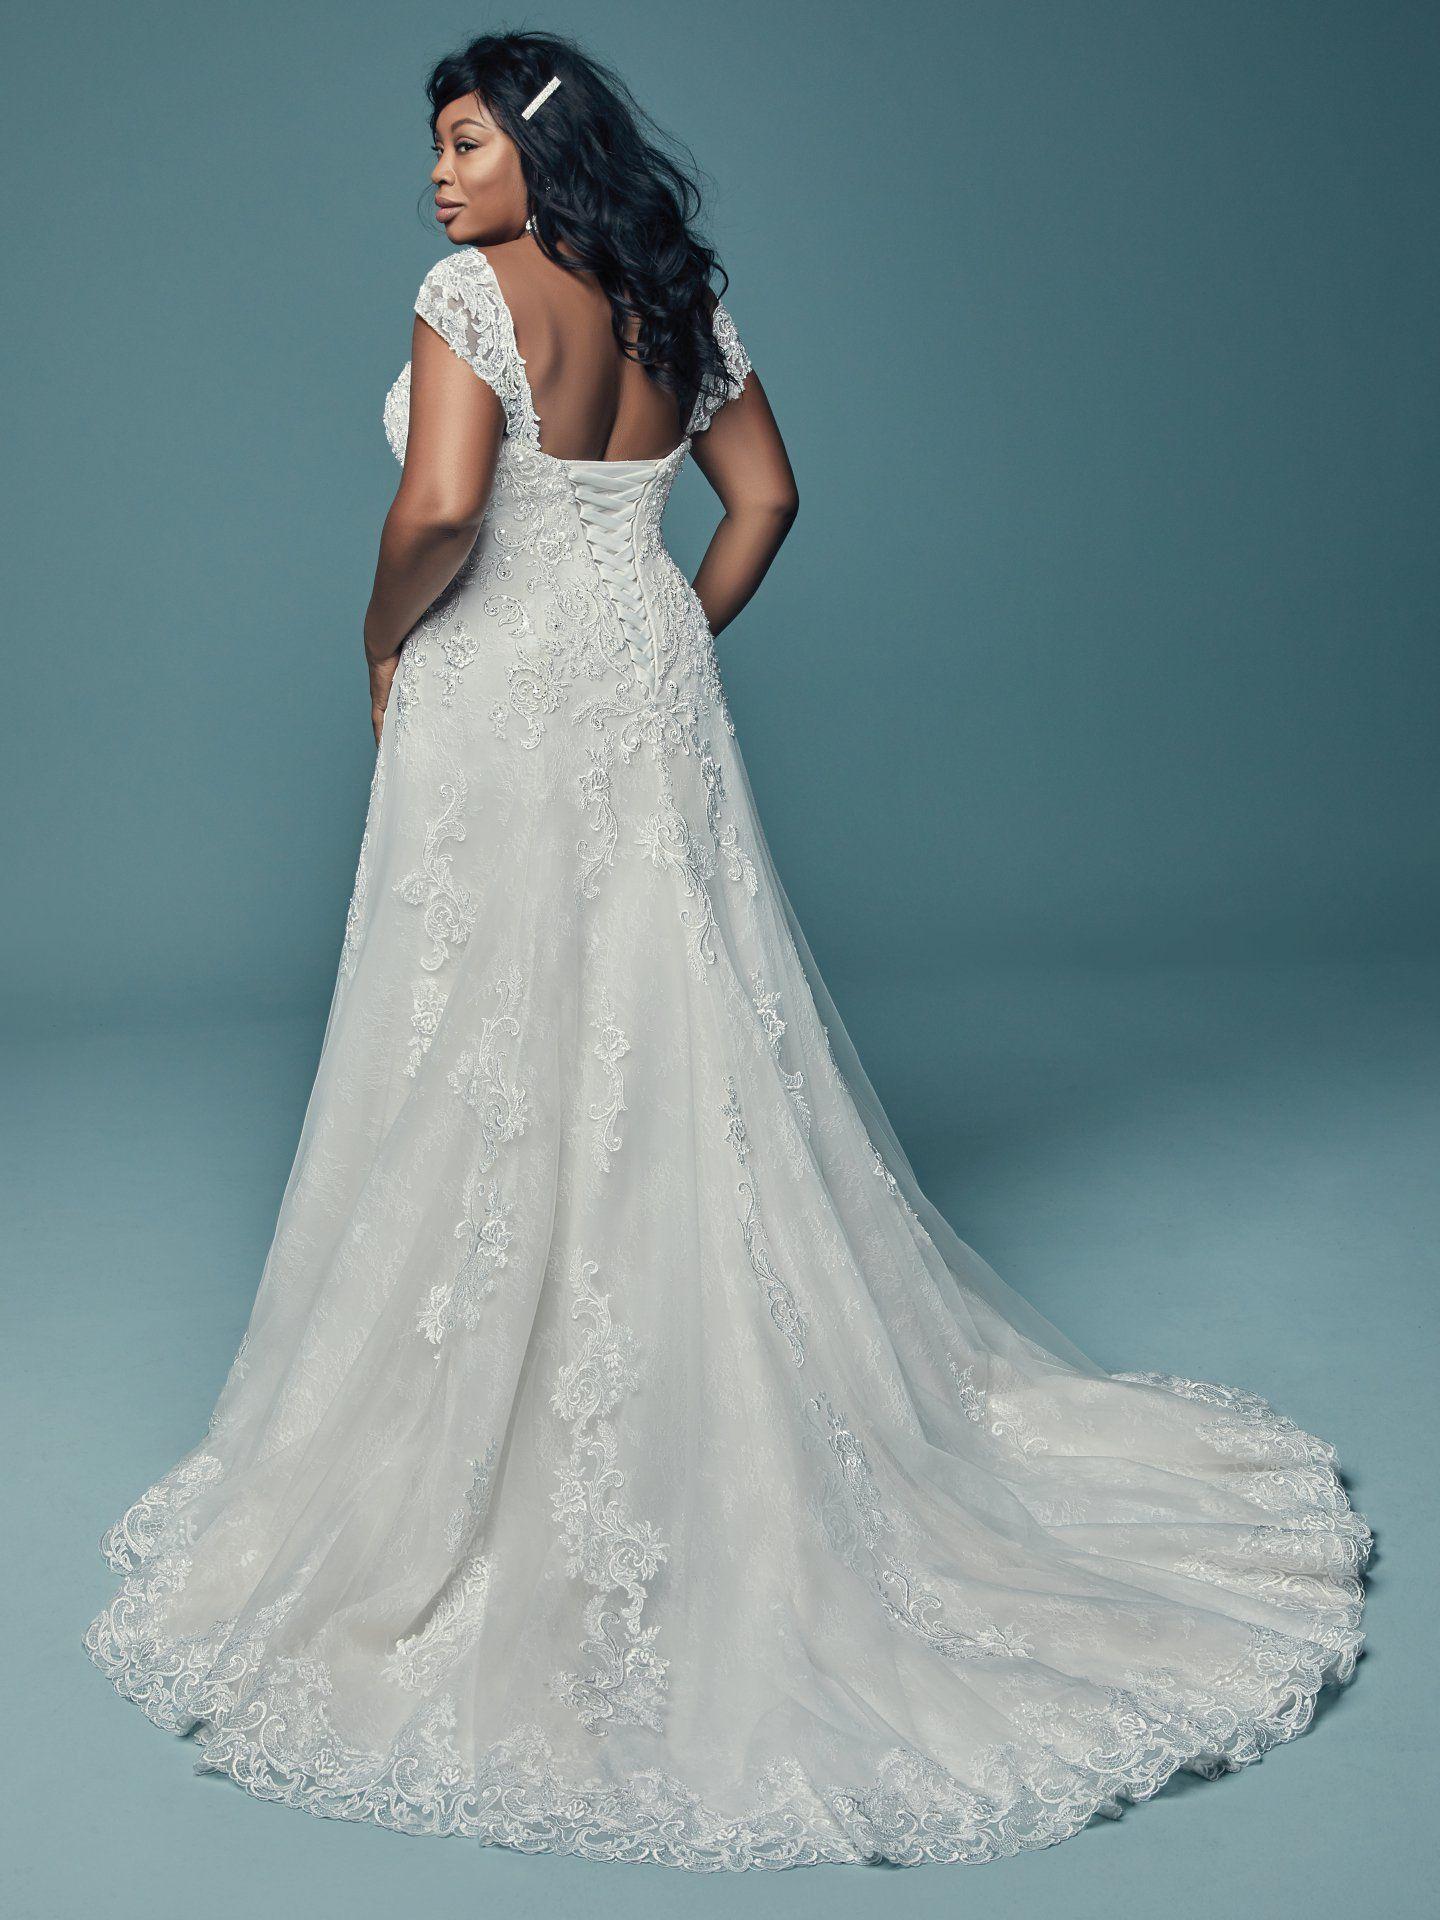 Plus size wedding dress designers  Plus size lace wedding dress with cap sleeves  Plus Size Wedding